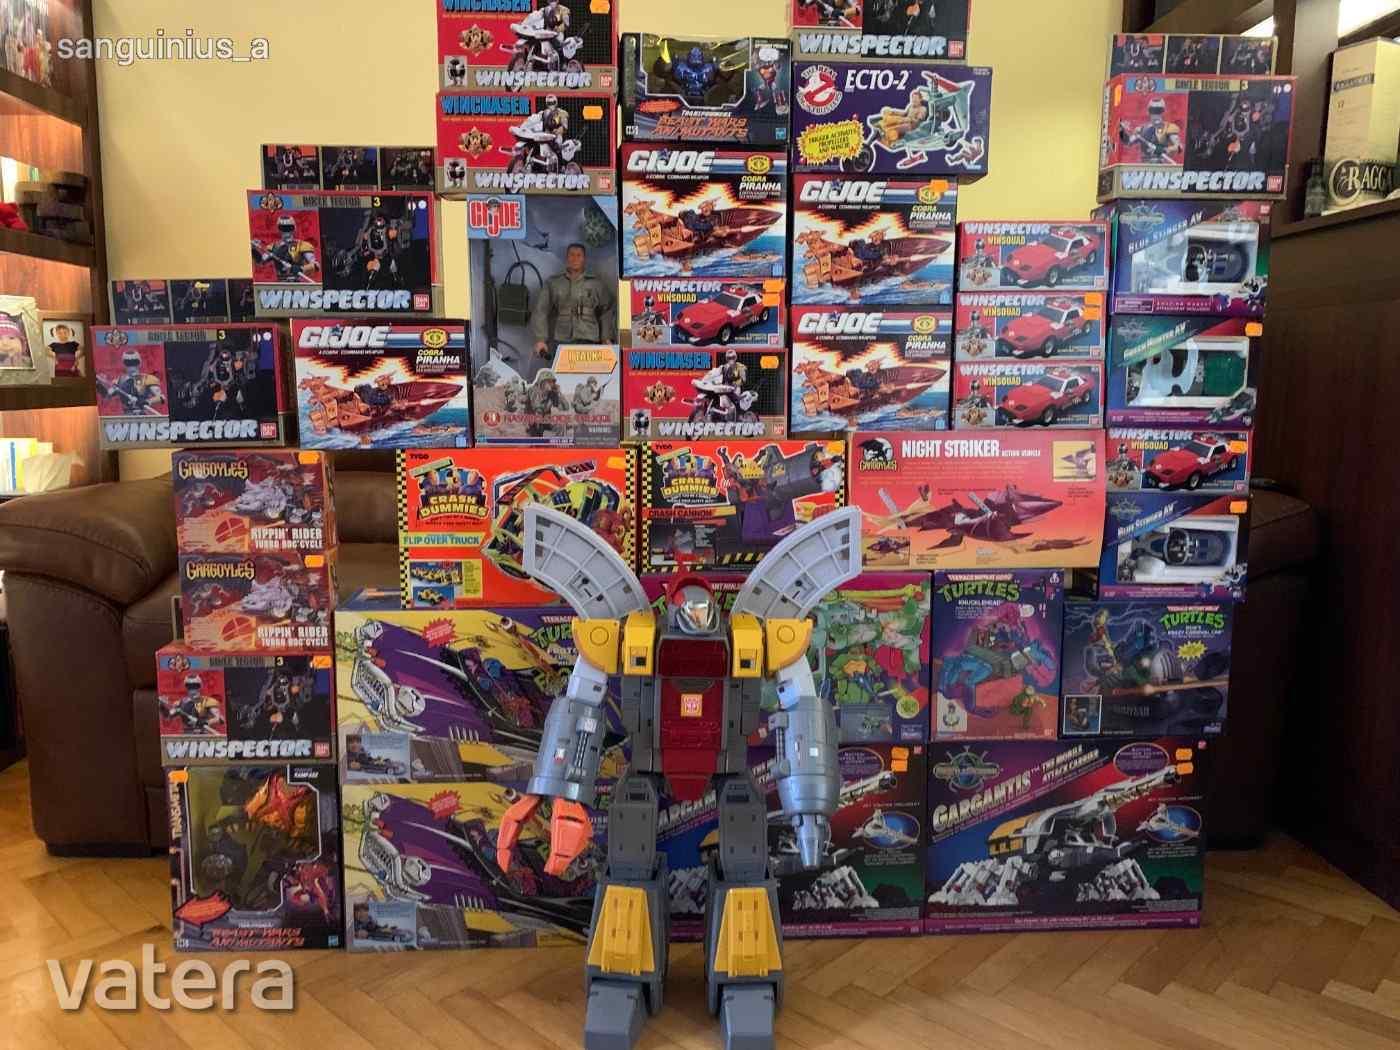 bontatlan-jatekhegy-80-90-es-evek-ghostbusters-g-i-joe-tnmt-crash-dumies-transformers-gargoyles-fe1b_2_big.jpg